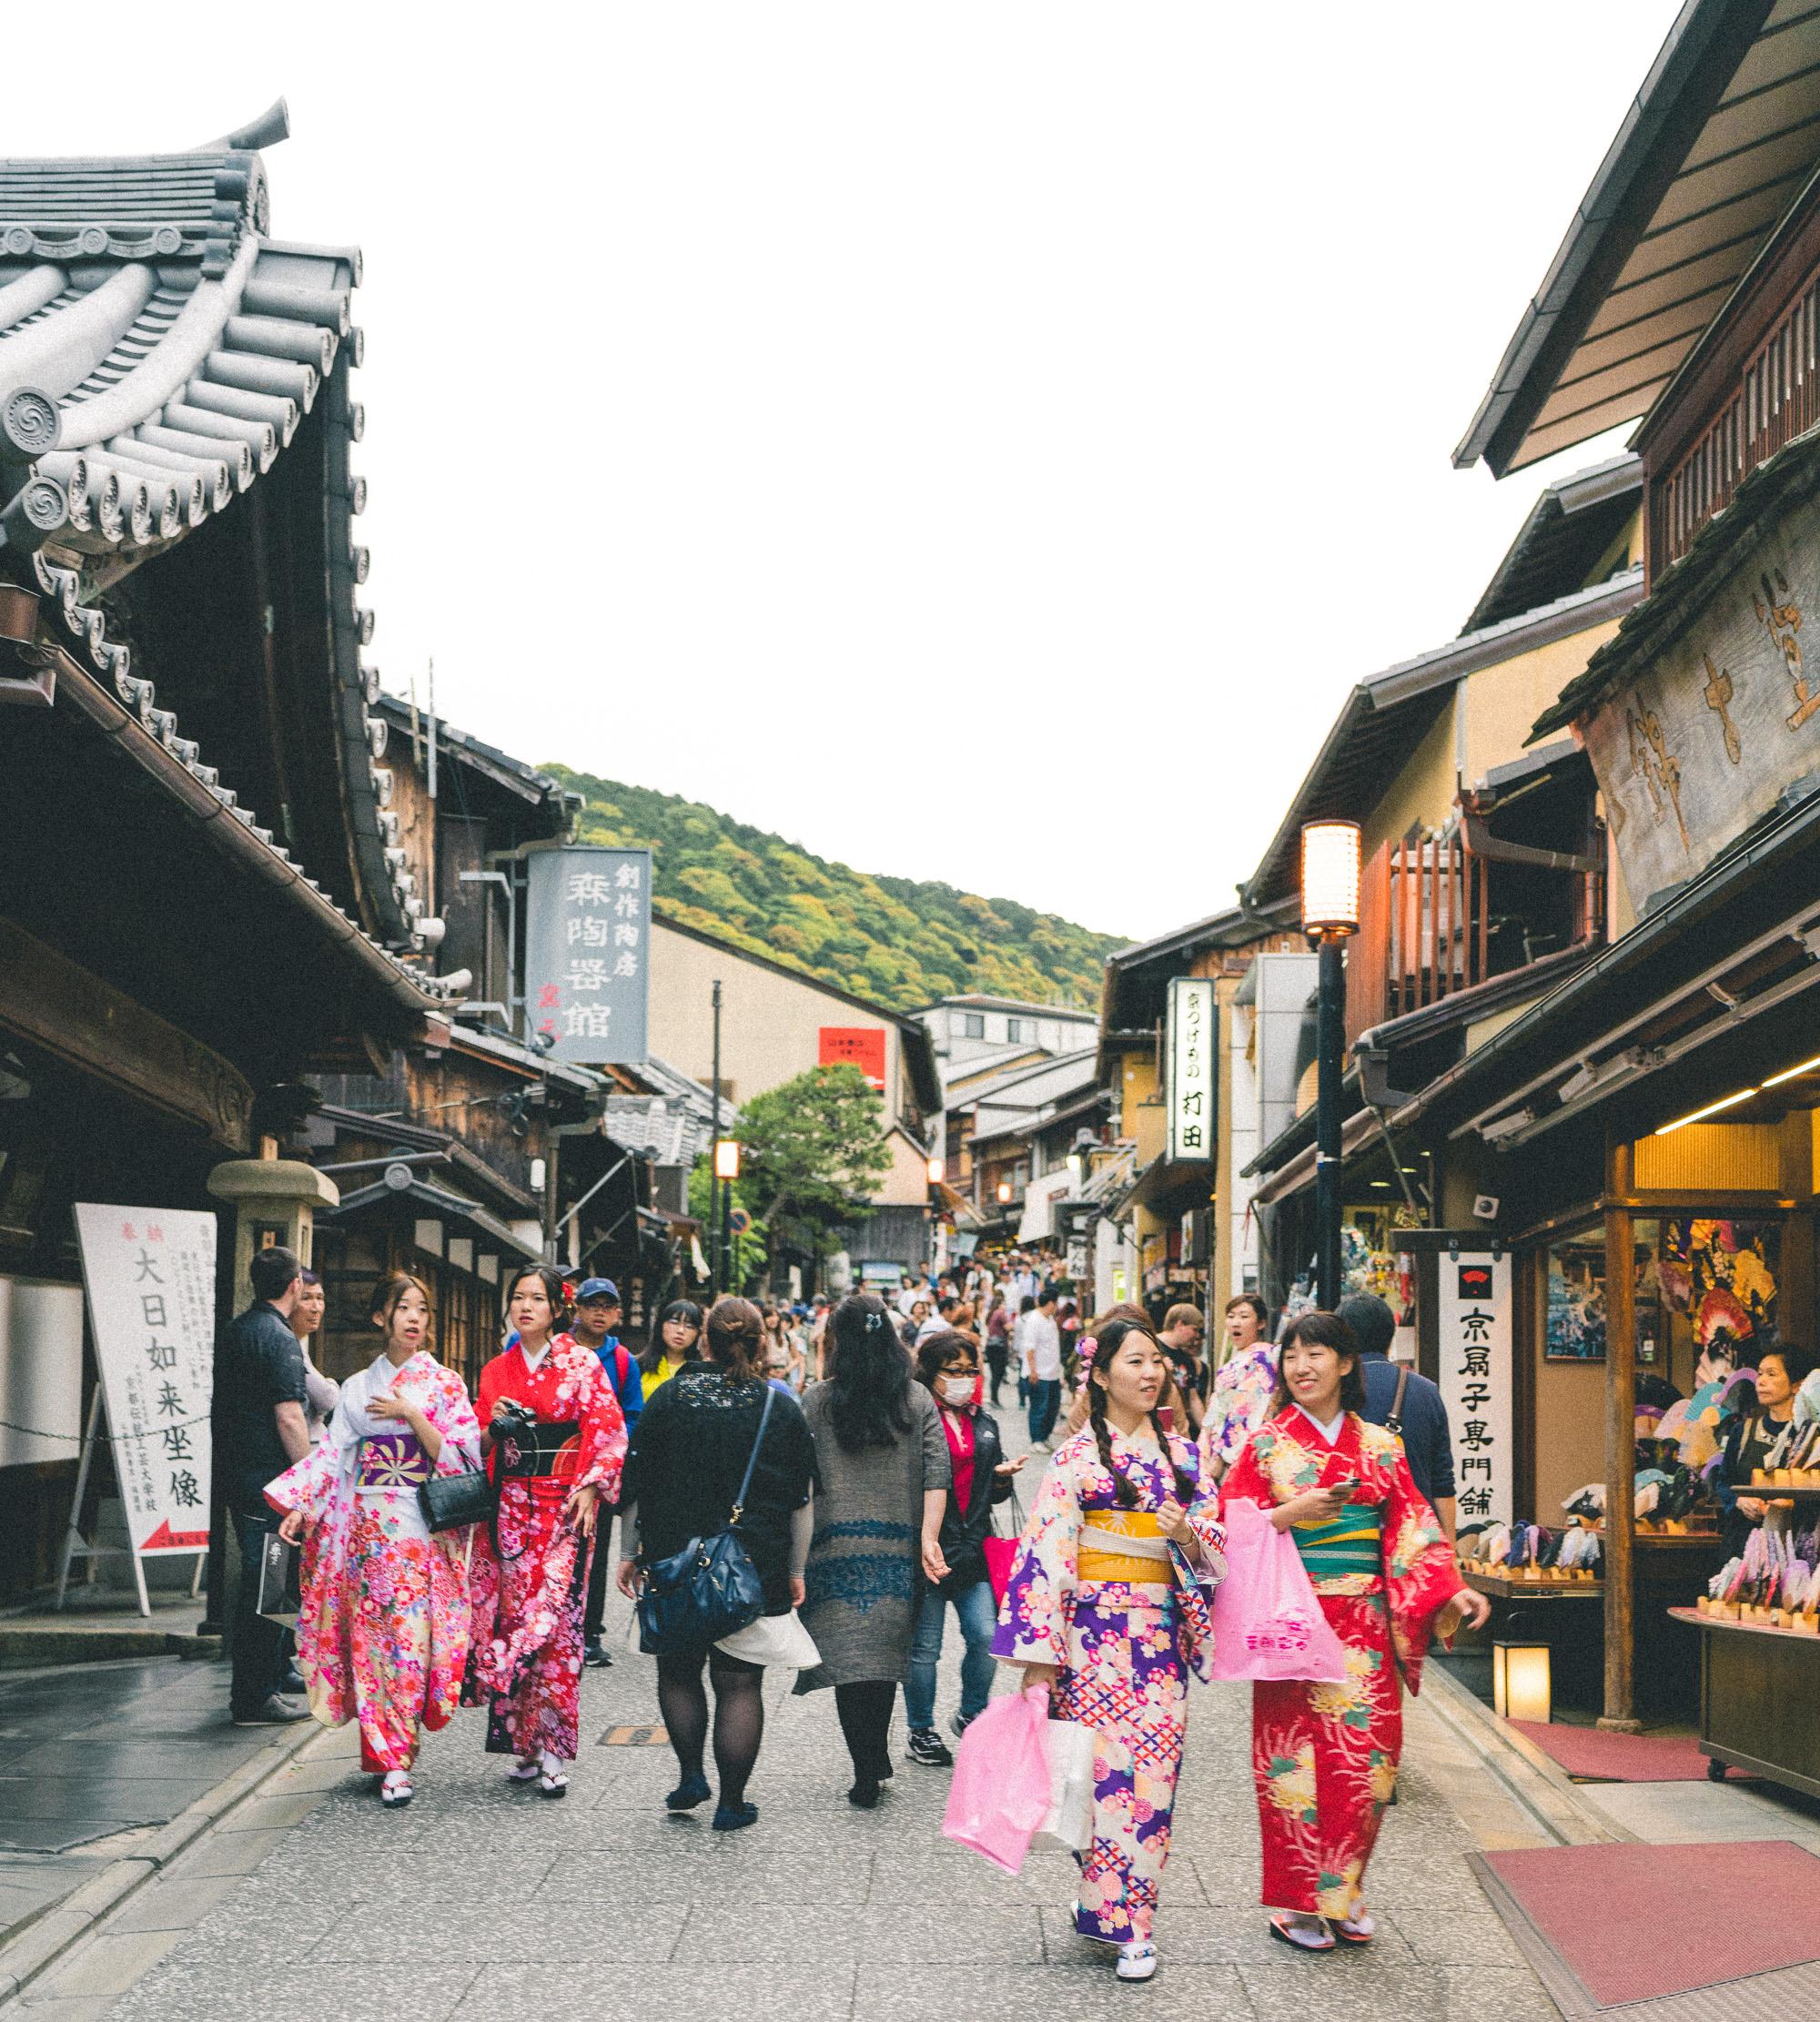 Matsubara Dori walking street below Kiyomizu-dera Temple in Kyoto, Japan | 24 Hour Guide to Kyoto, Japan | 1 Day Guide Kyoto | Kyoto City Guide | Kyoto Travel Itinerary